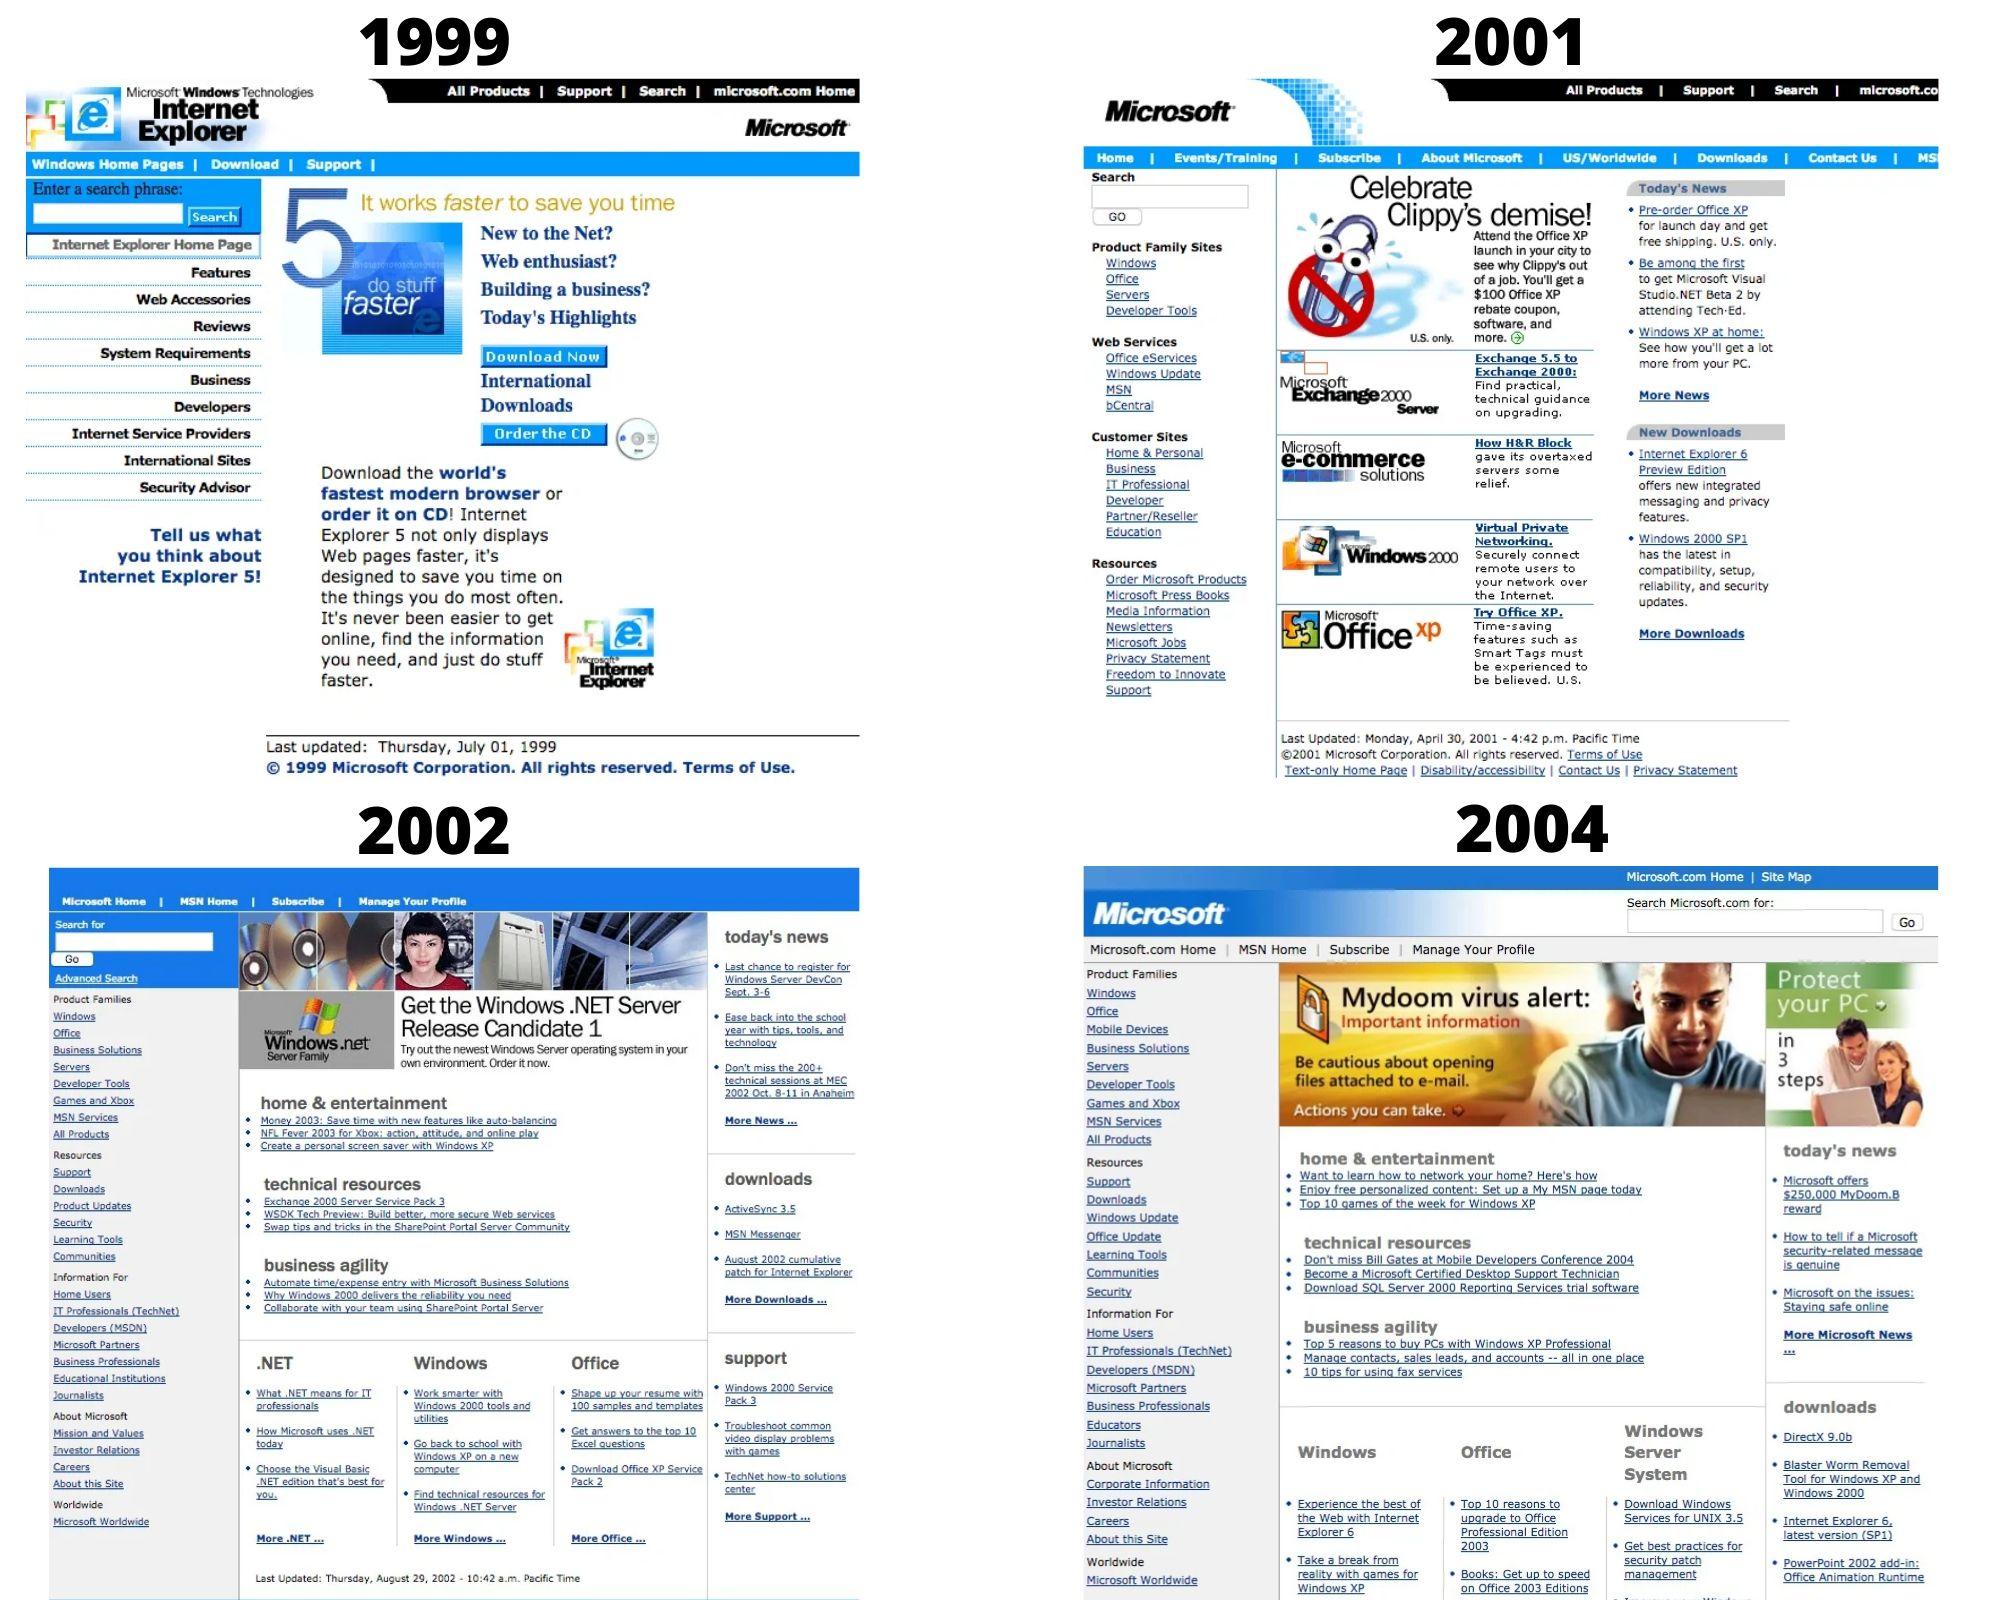 Microsoft design 199 to 2004